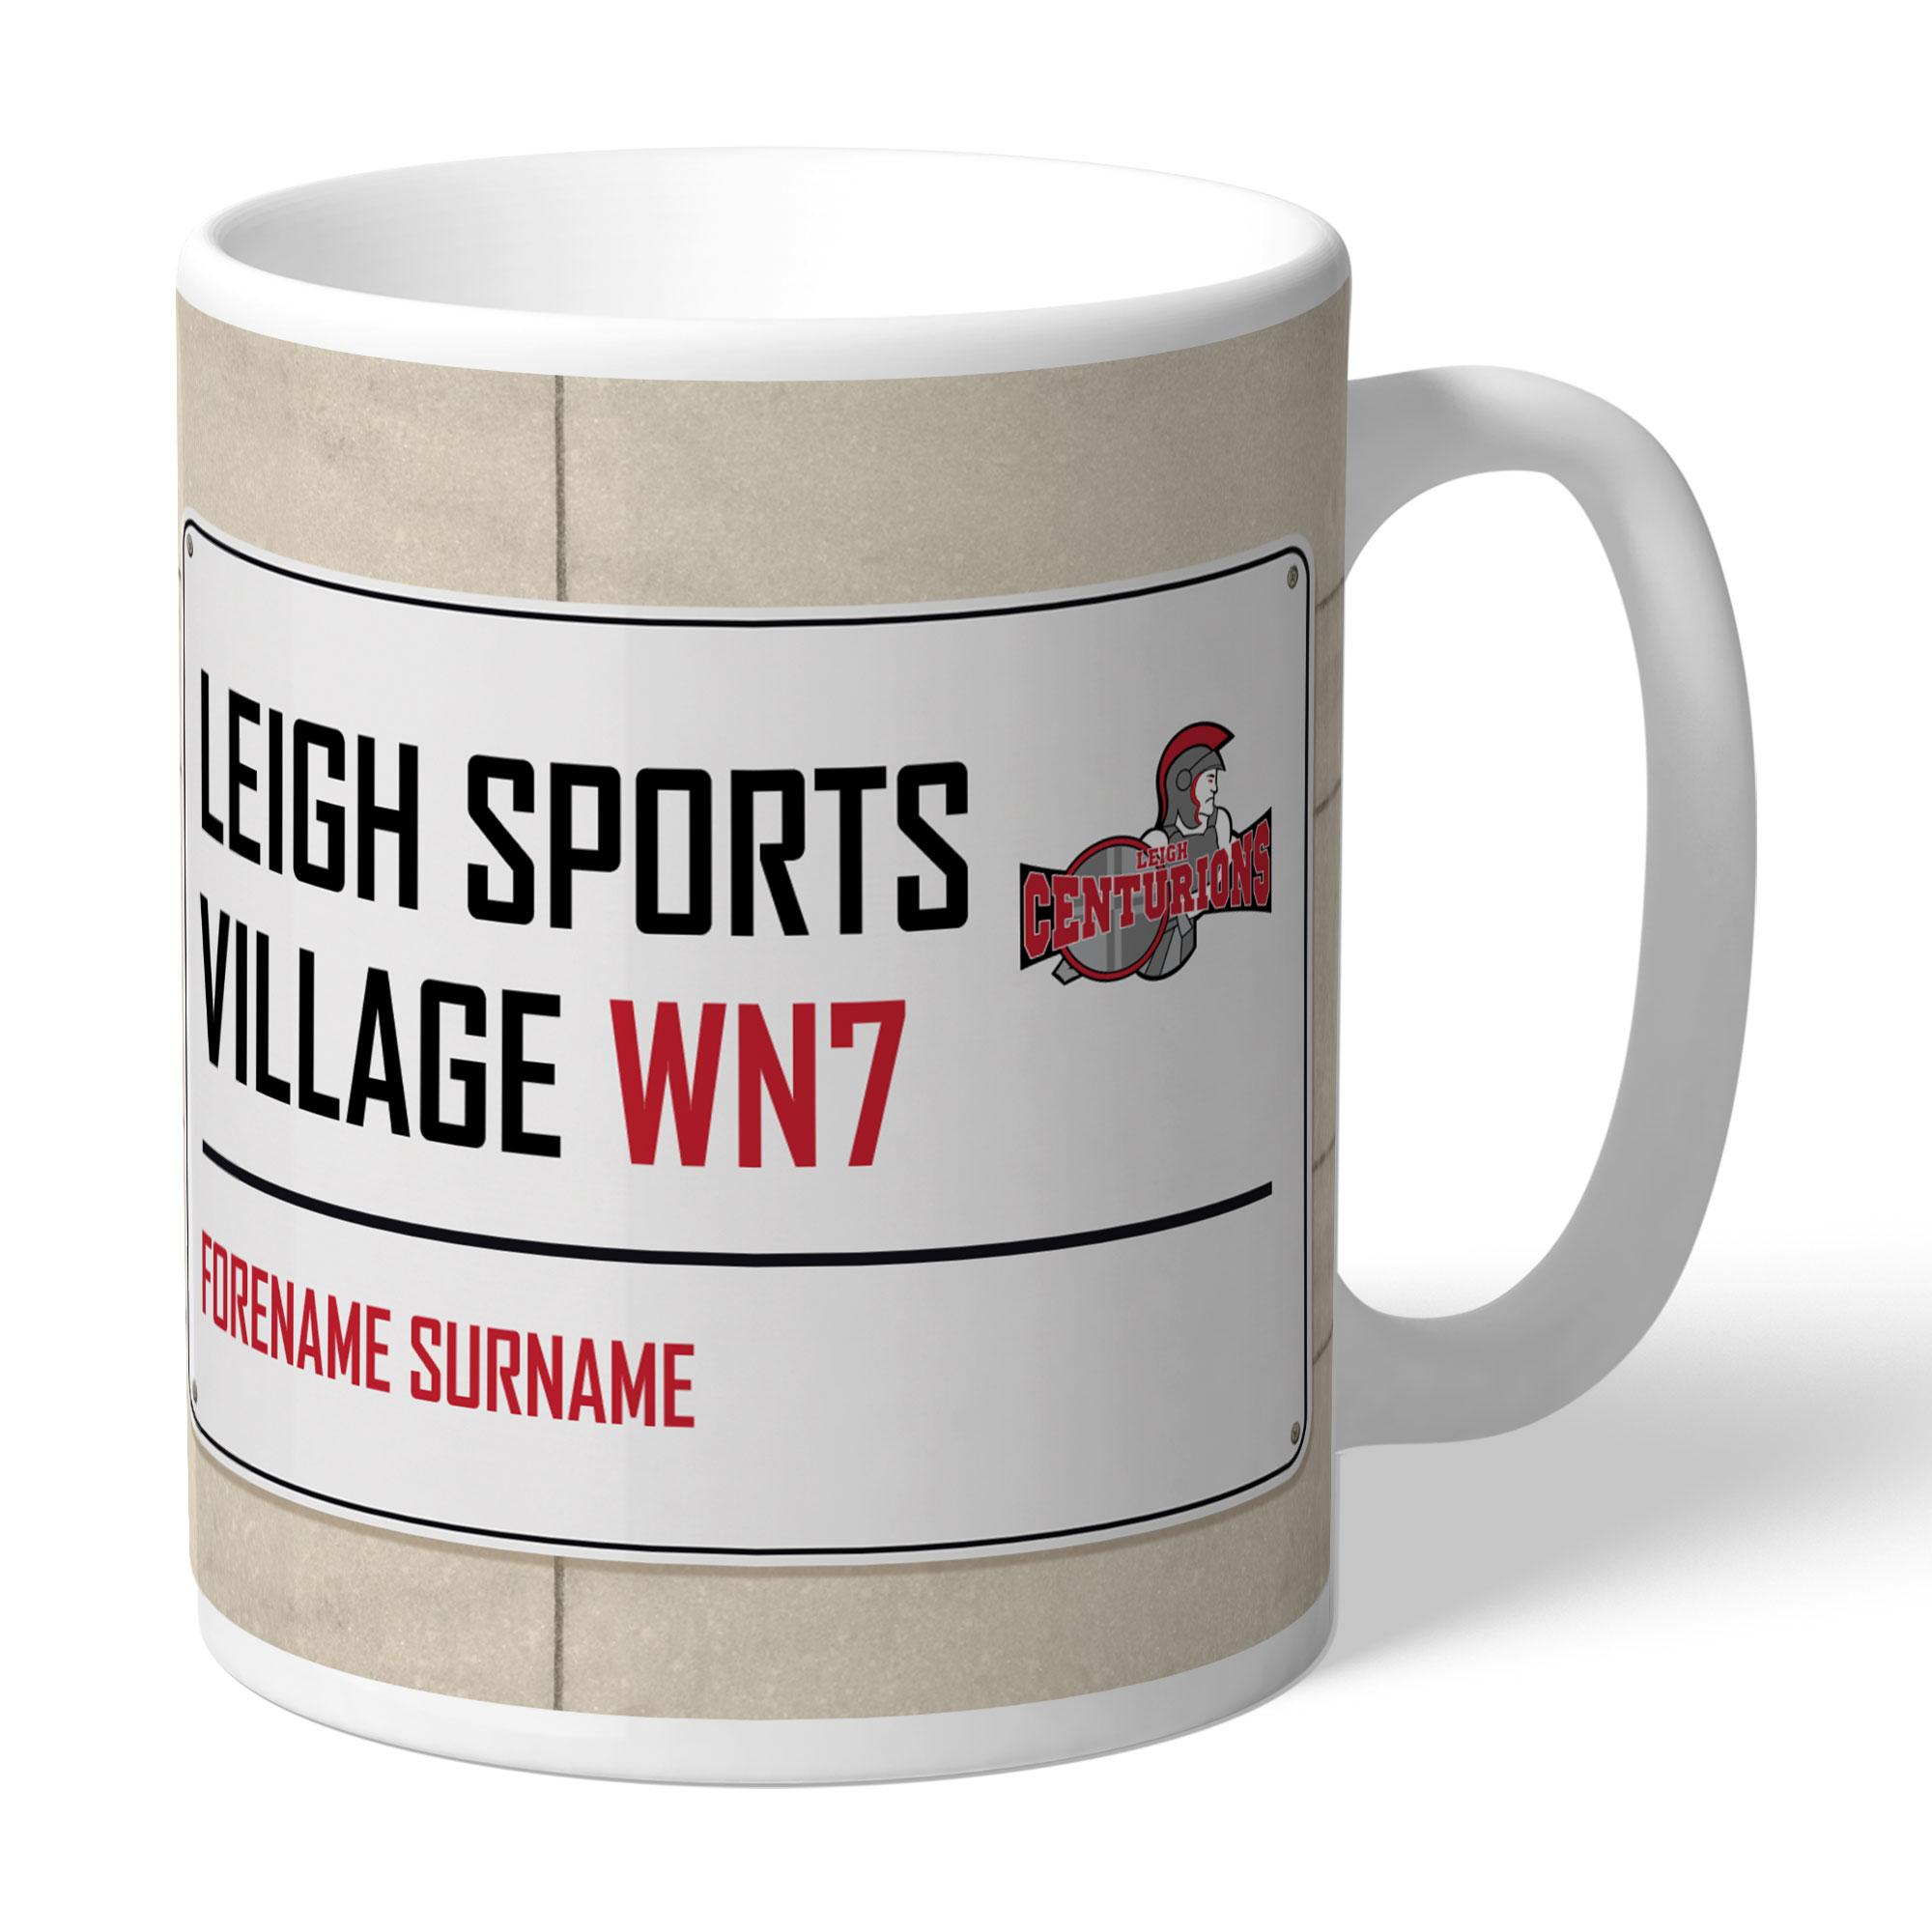 Leigh Centurions Street Sign Mug